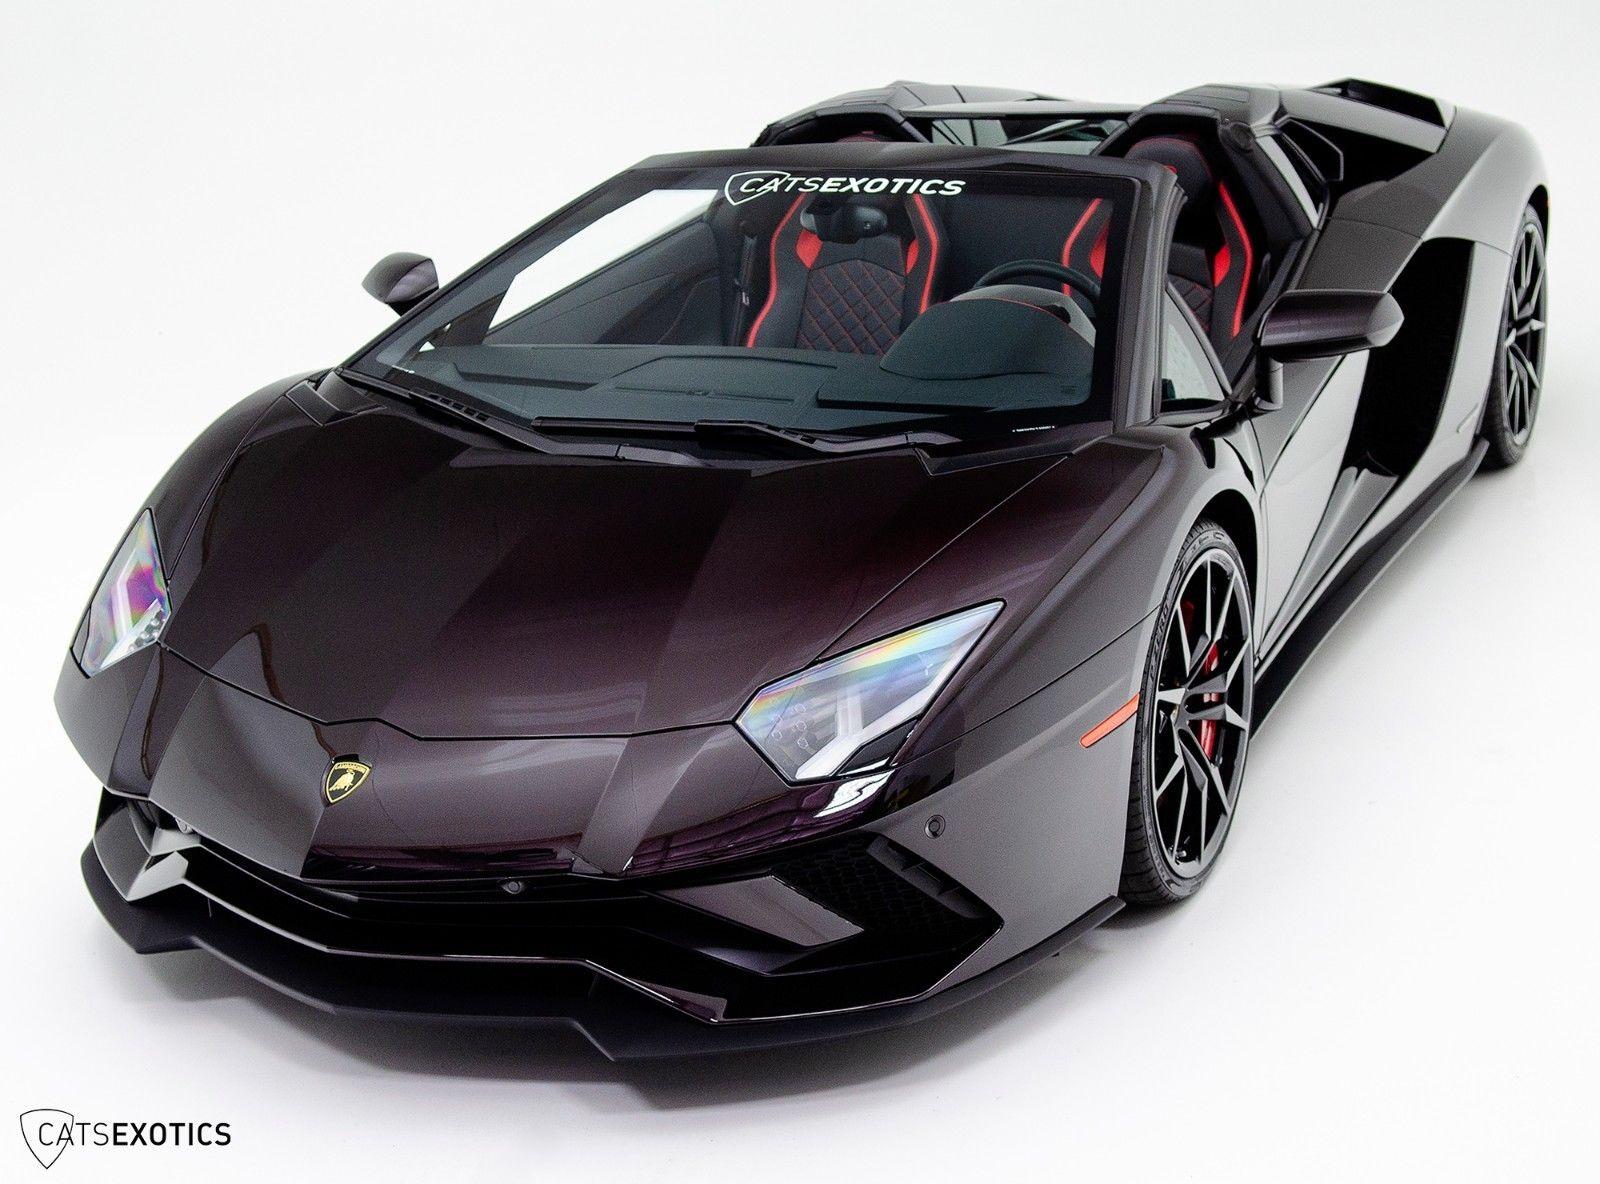 Awesome Lamborghini Aventador S Roadster Nero Granatus 14 800 Paint